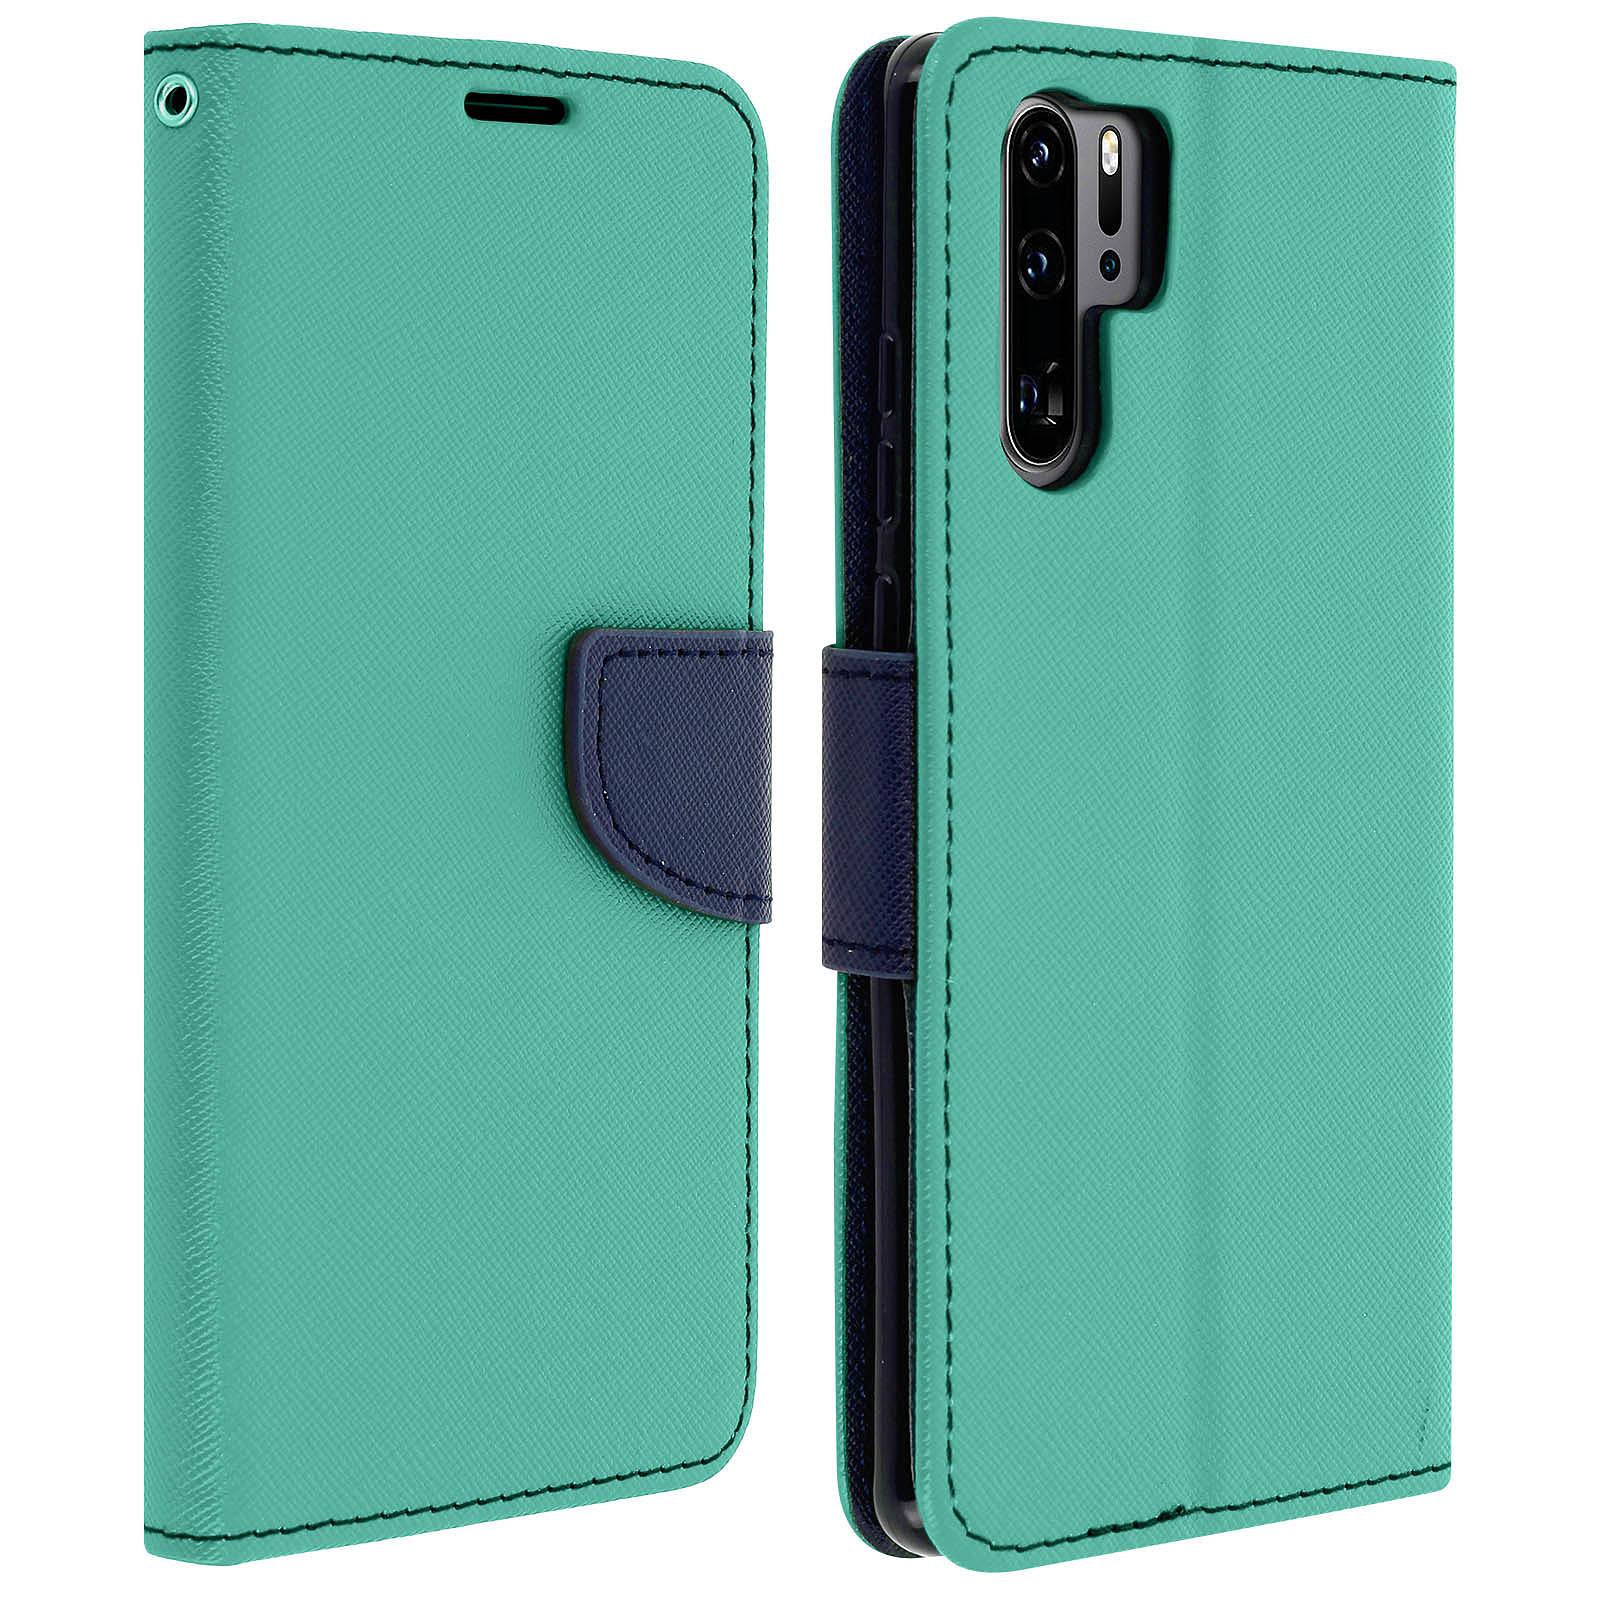 Avizar Etui folio Vert pour Huawei P30 Pro